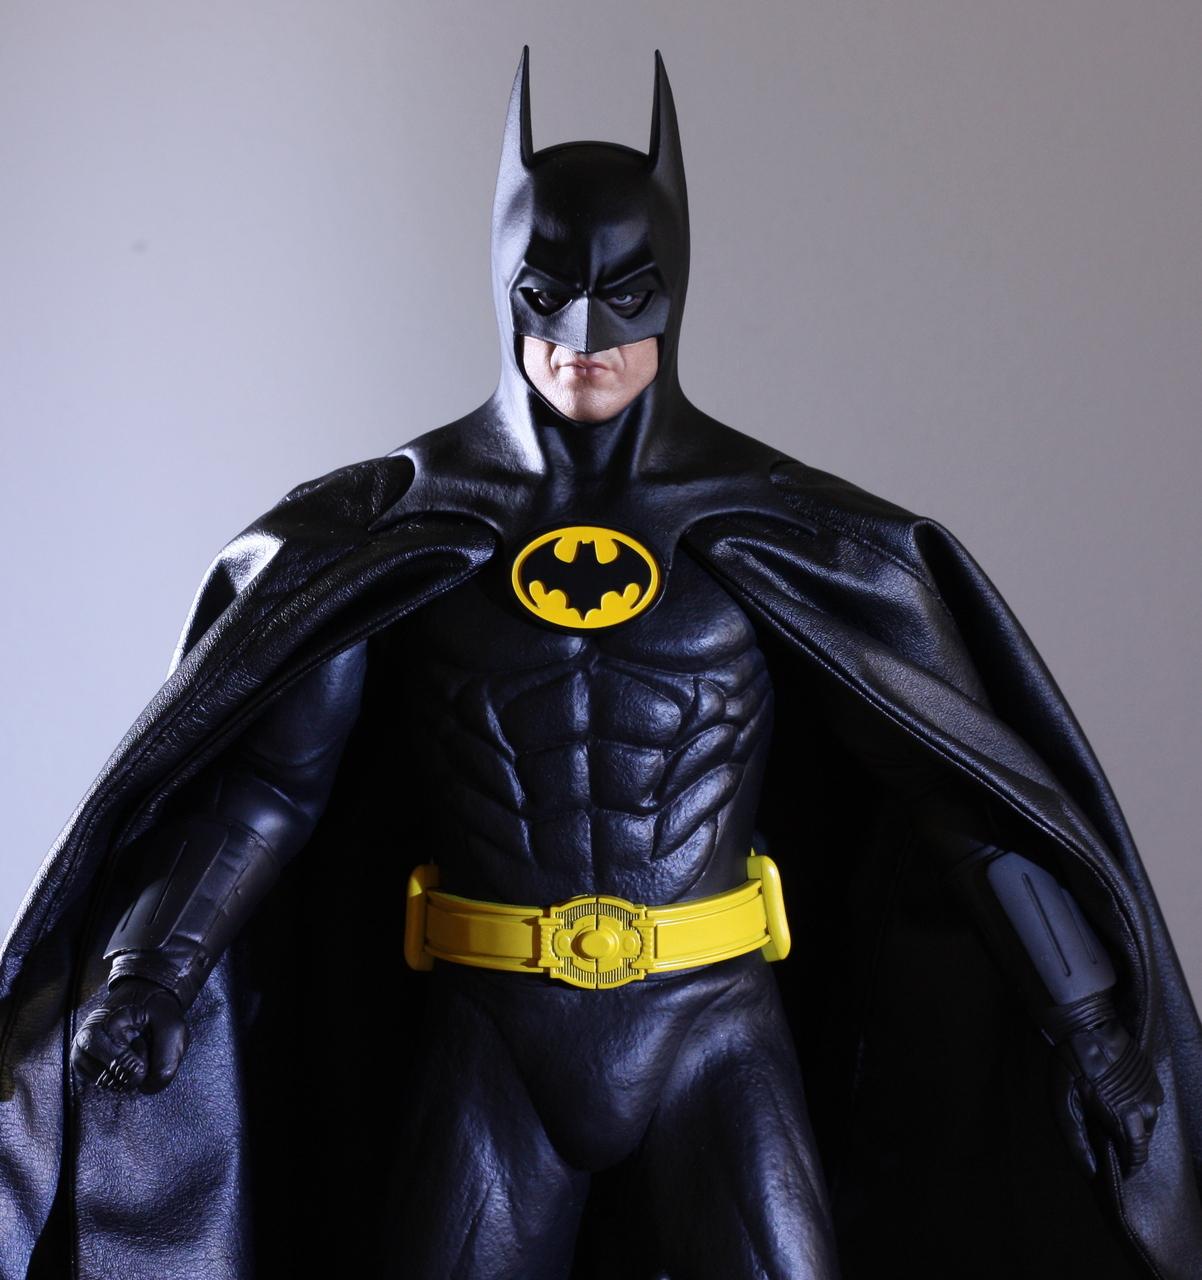 Http Www Emirates247 Com Entertainment Best Batman Bale Vs Affleck Or Val Kilmer 2013 08 26 1 518784